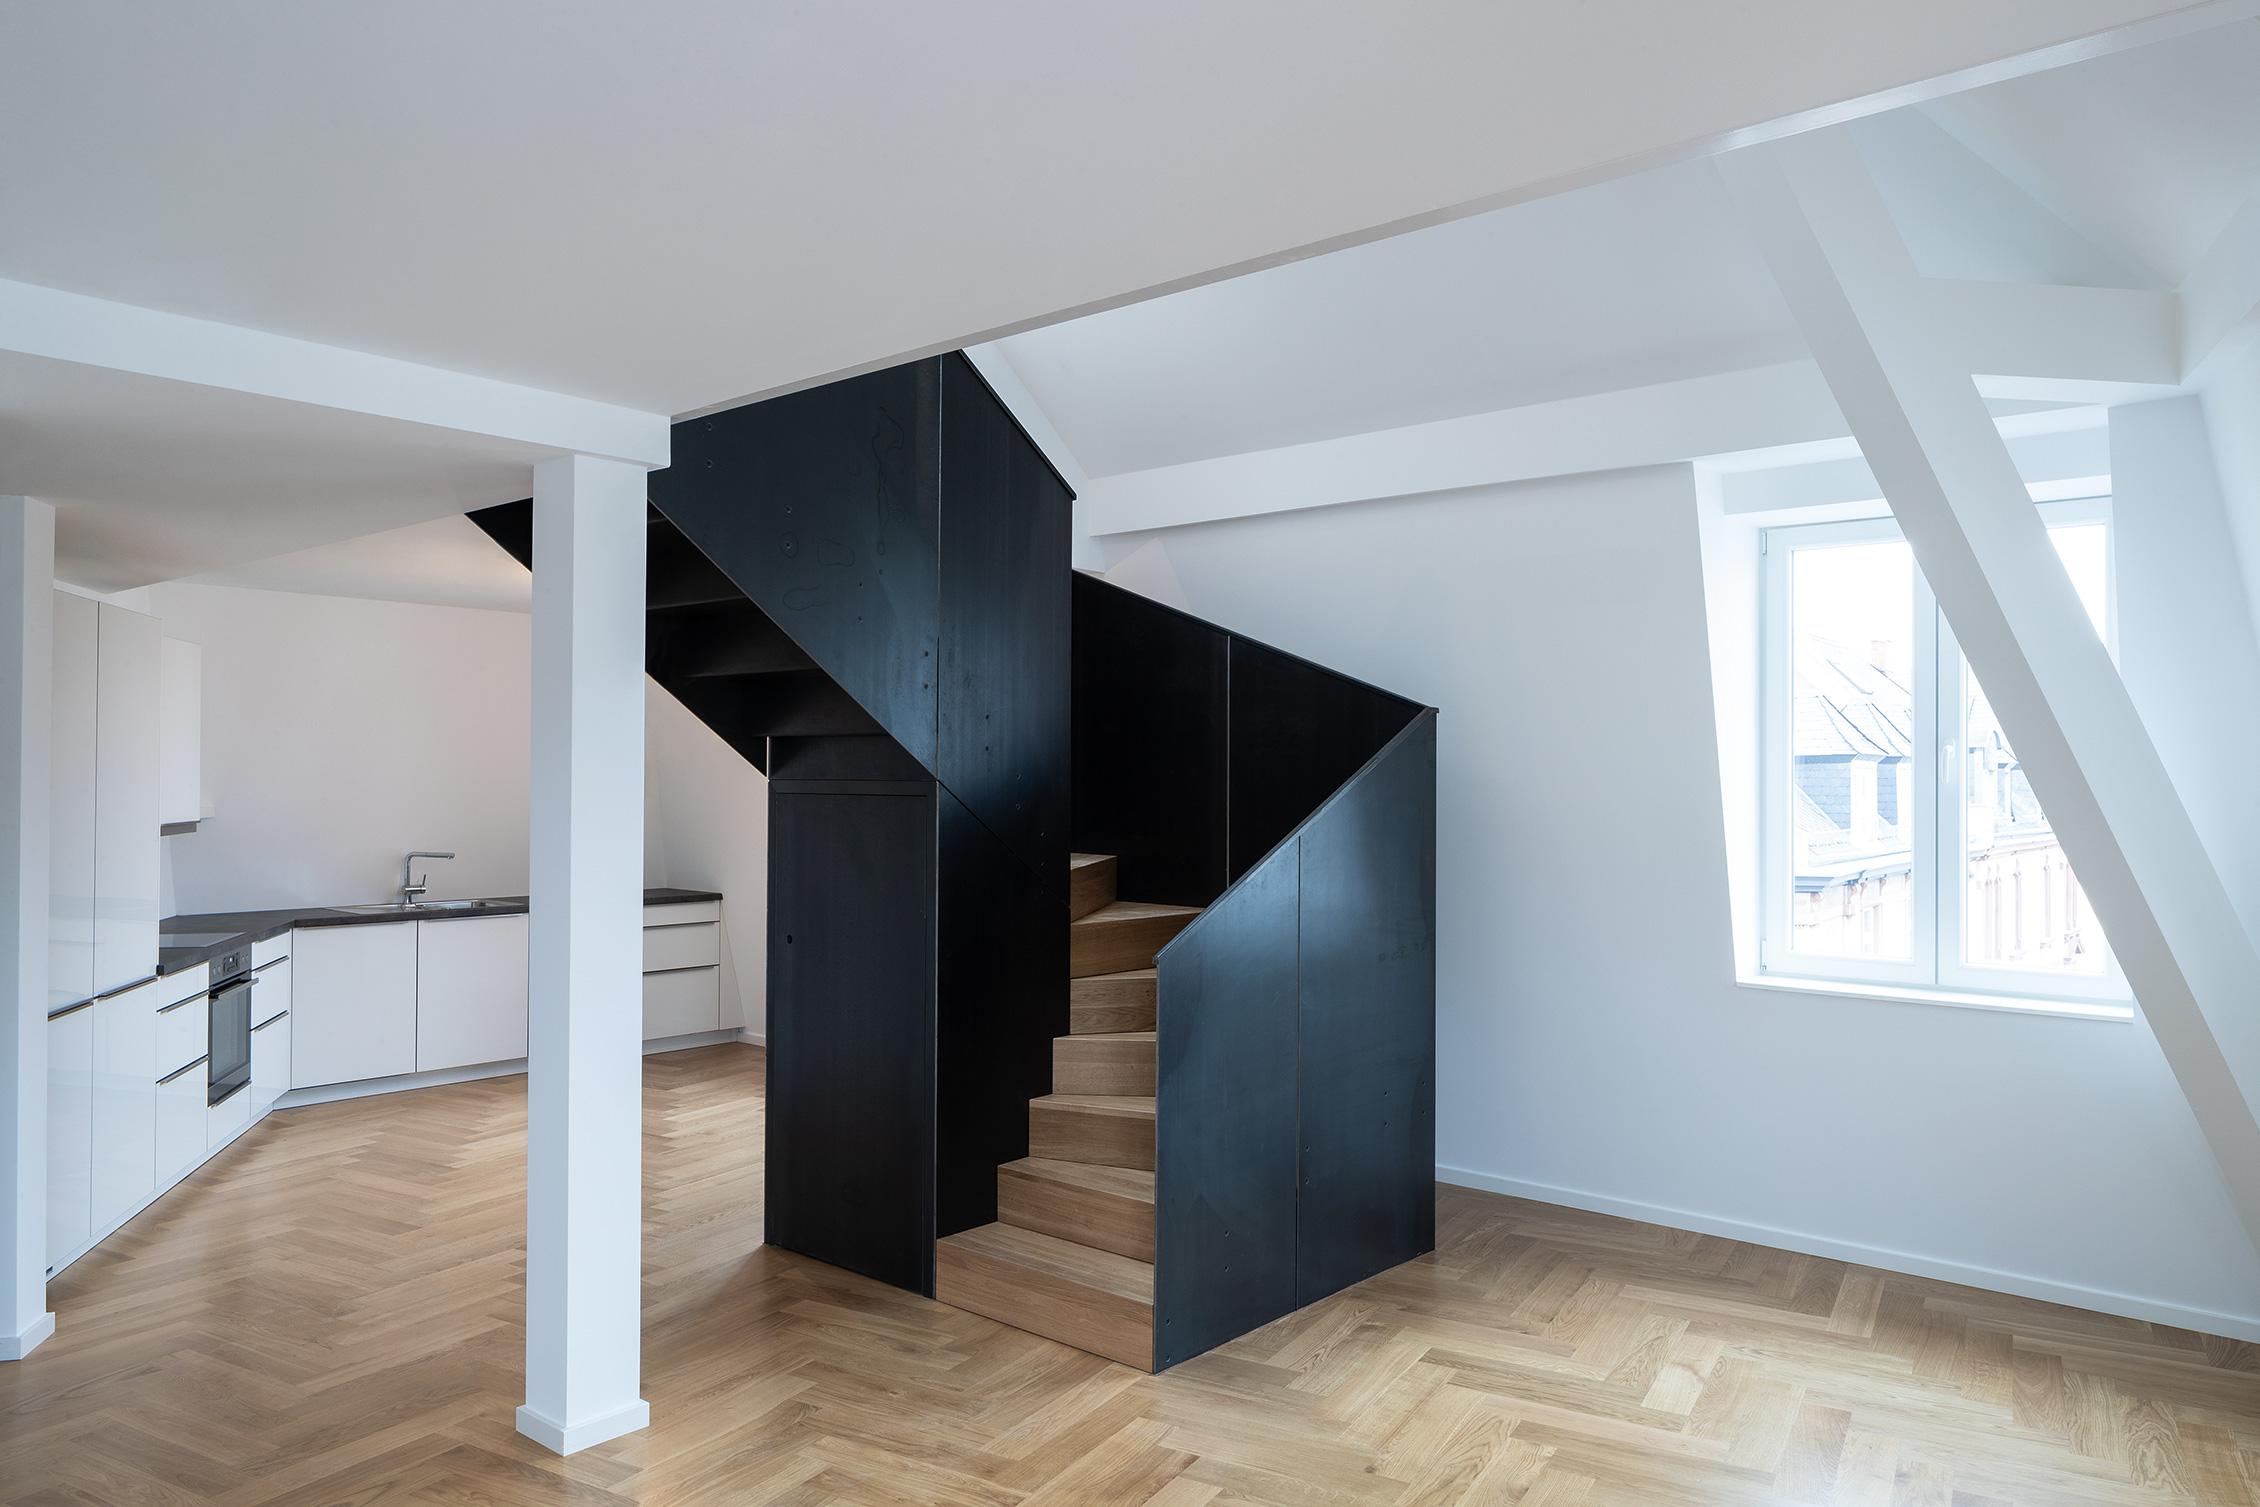 Indesign Architektur Architekturbüro Frankfurt Architekten